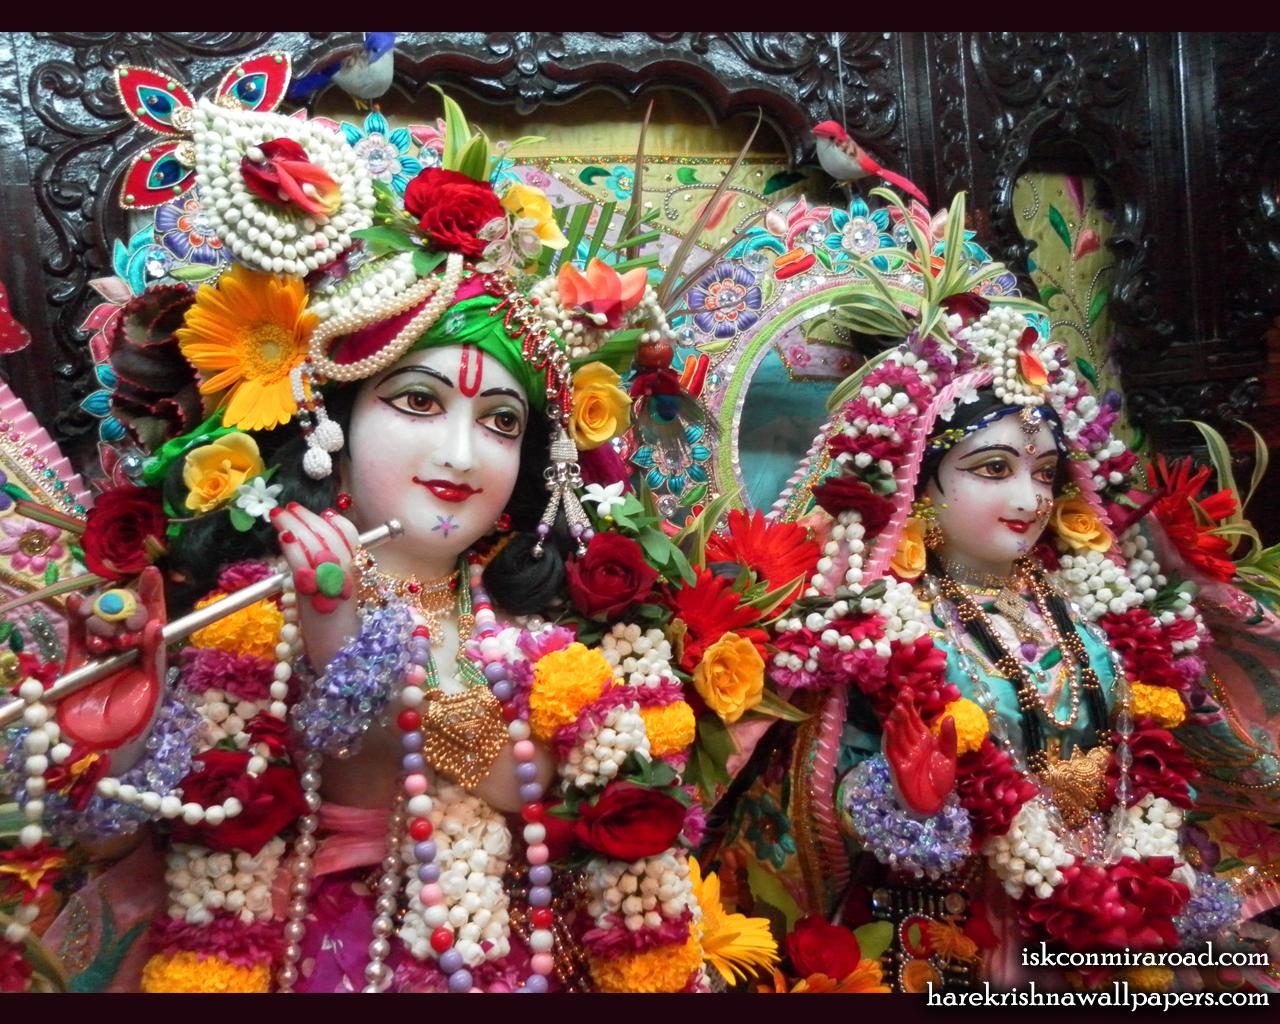 Sri Sri Radha Giridhari Close up Wallpaper (013) Size 1280x1024 Download